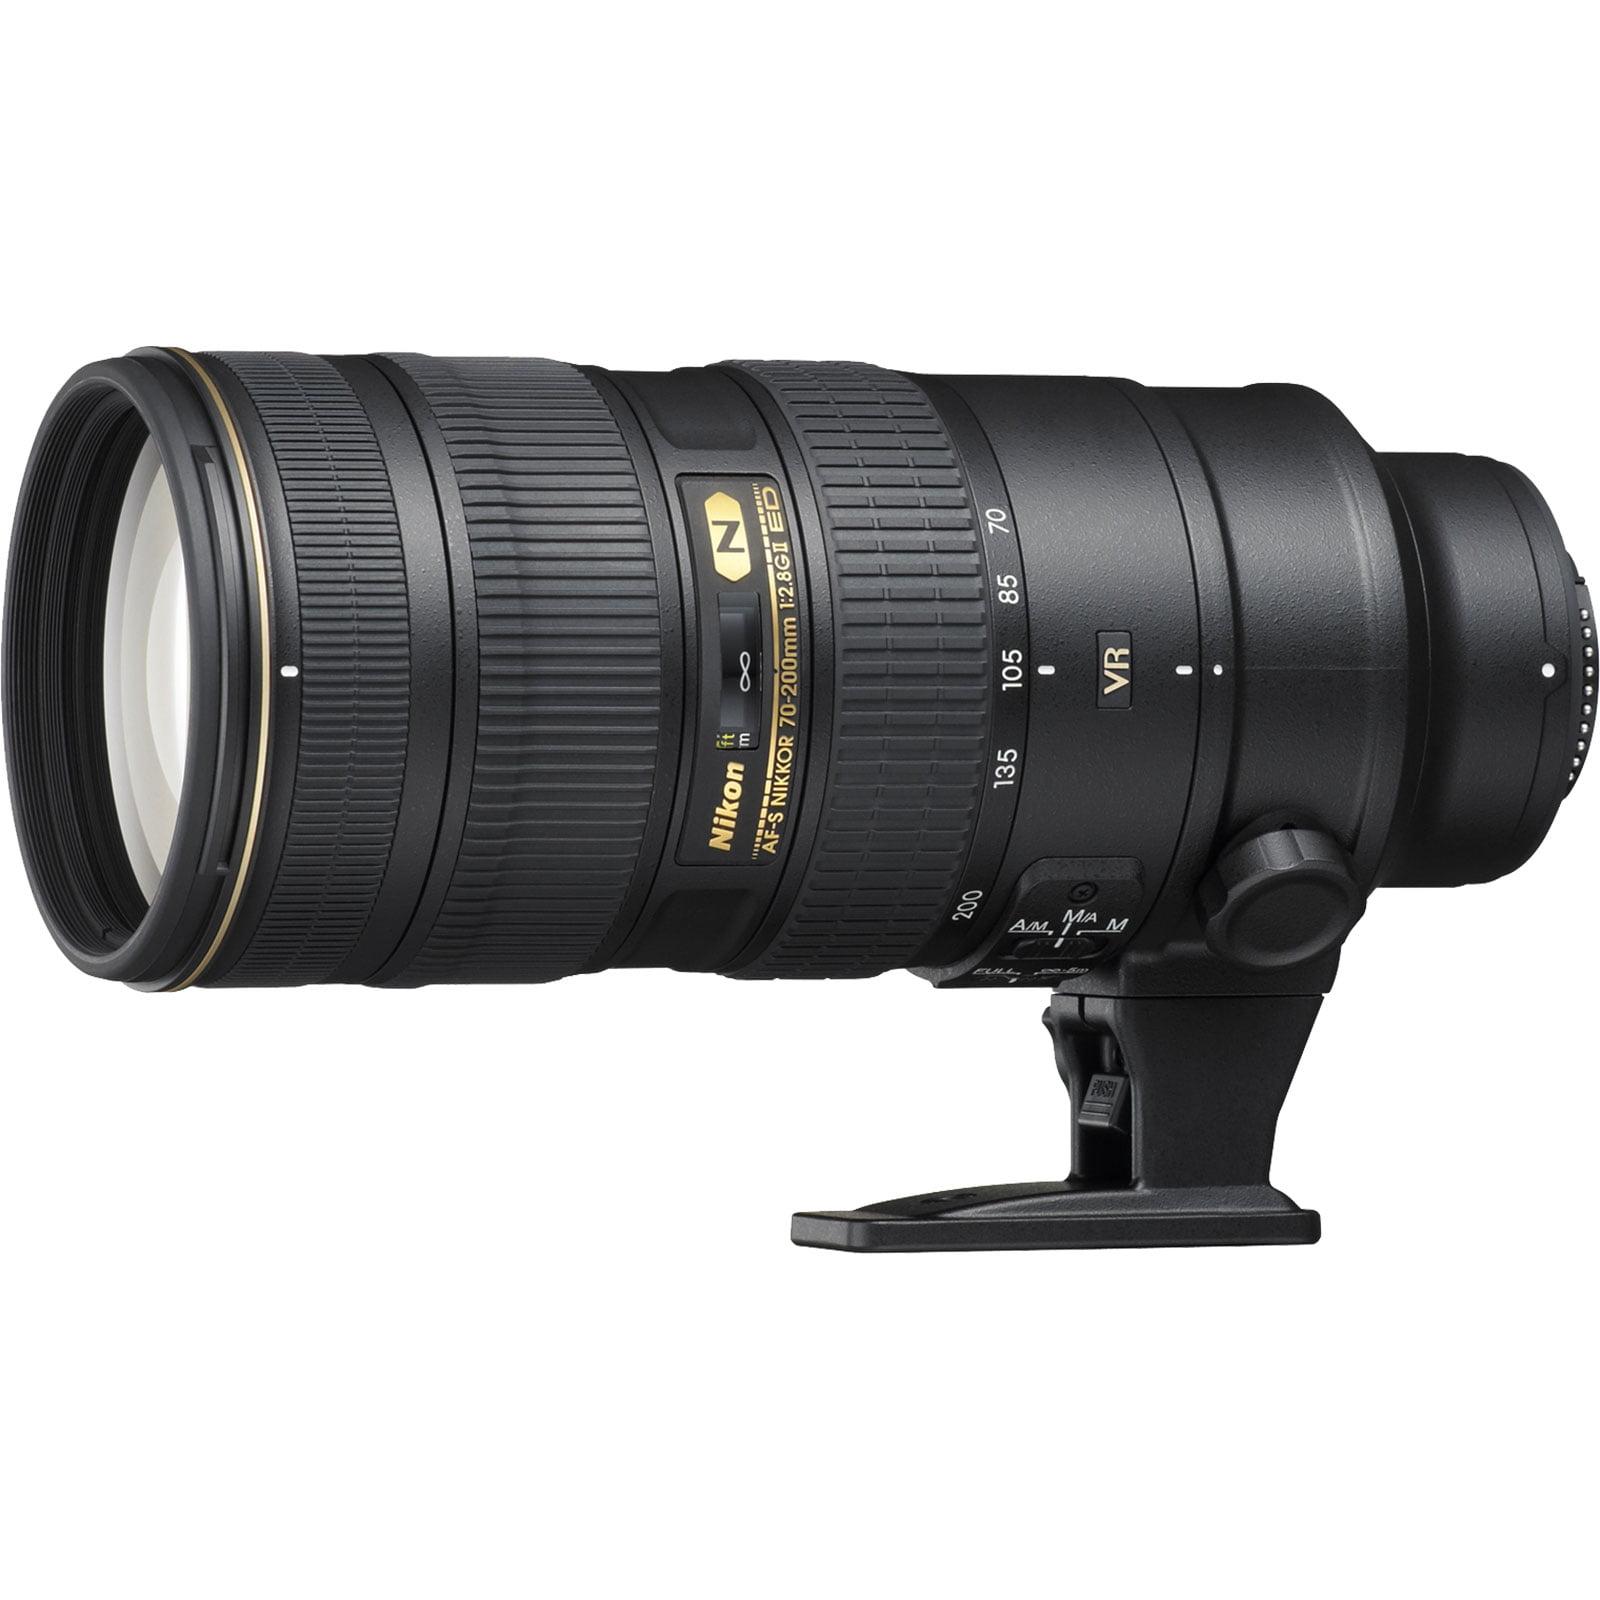 Nikon 70-200mm f/2.8G VR II AF-S ED-IF Zoom-Nikkor Lens - Factory Refurbished includes Full 1 Year Warranty